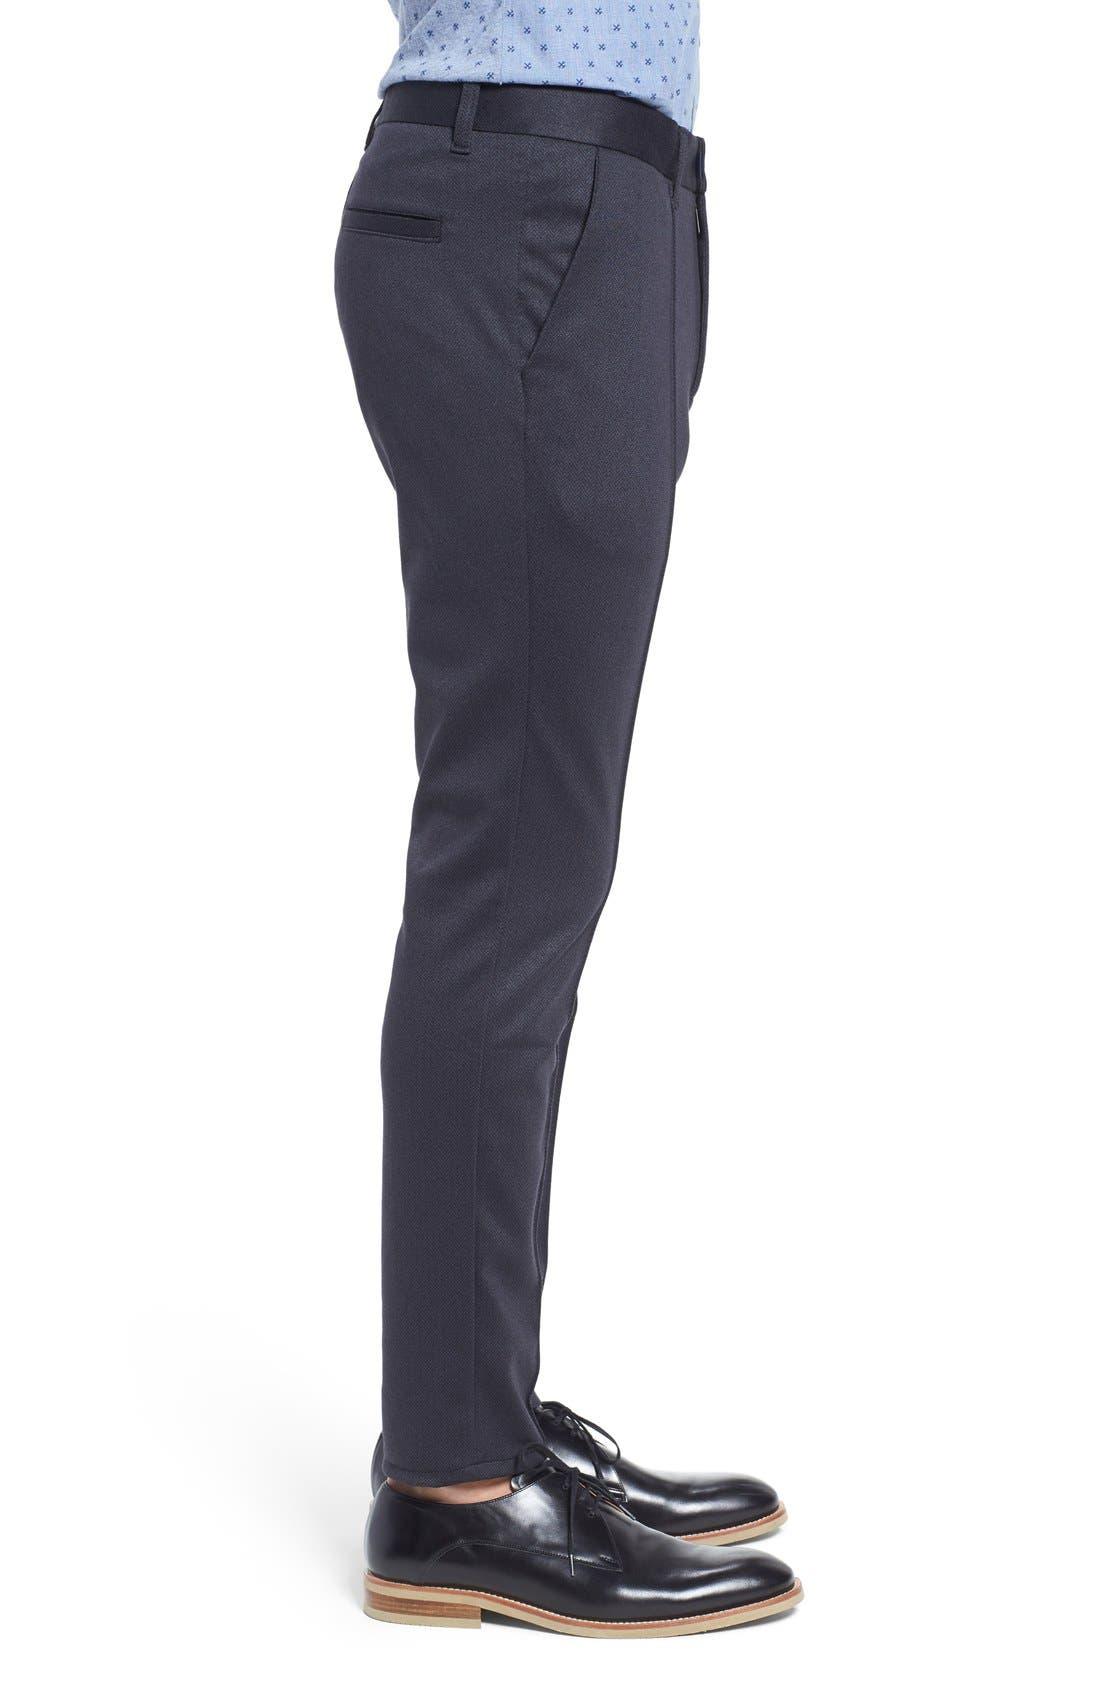 Prospect Herringbone Slim Fit Trousers,                             Alternate thumbnail 4, color,                             001